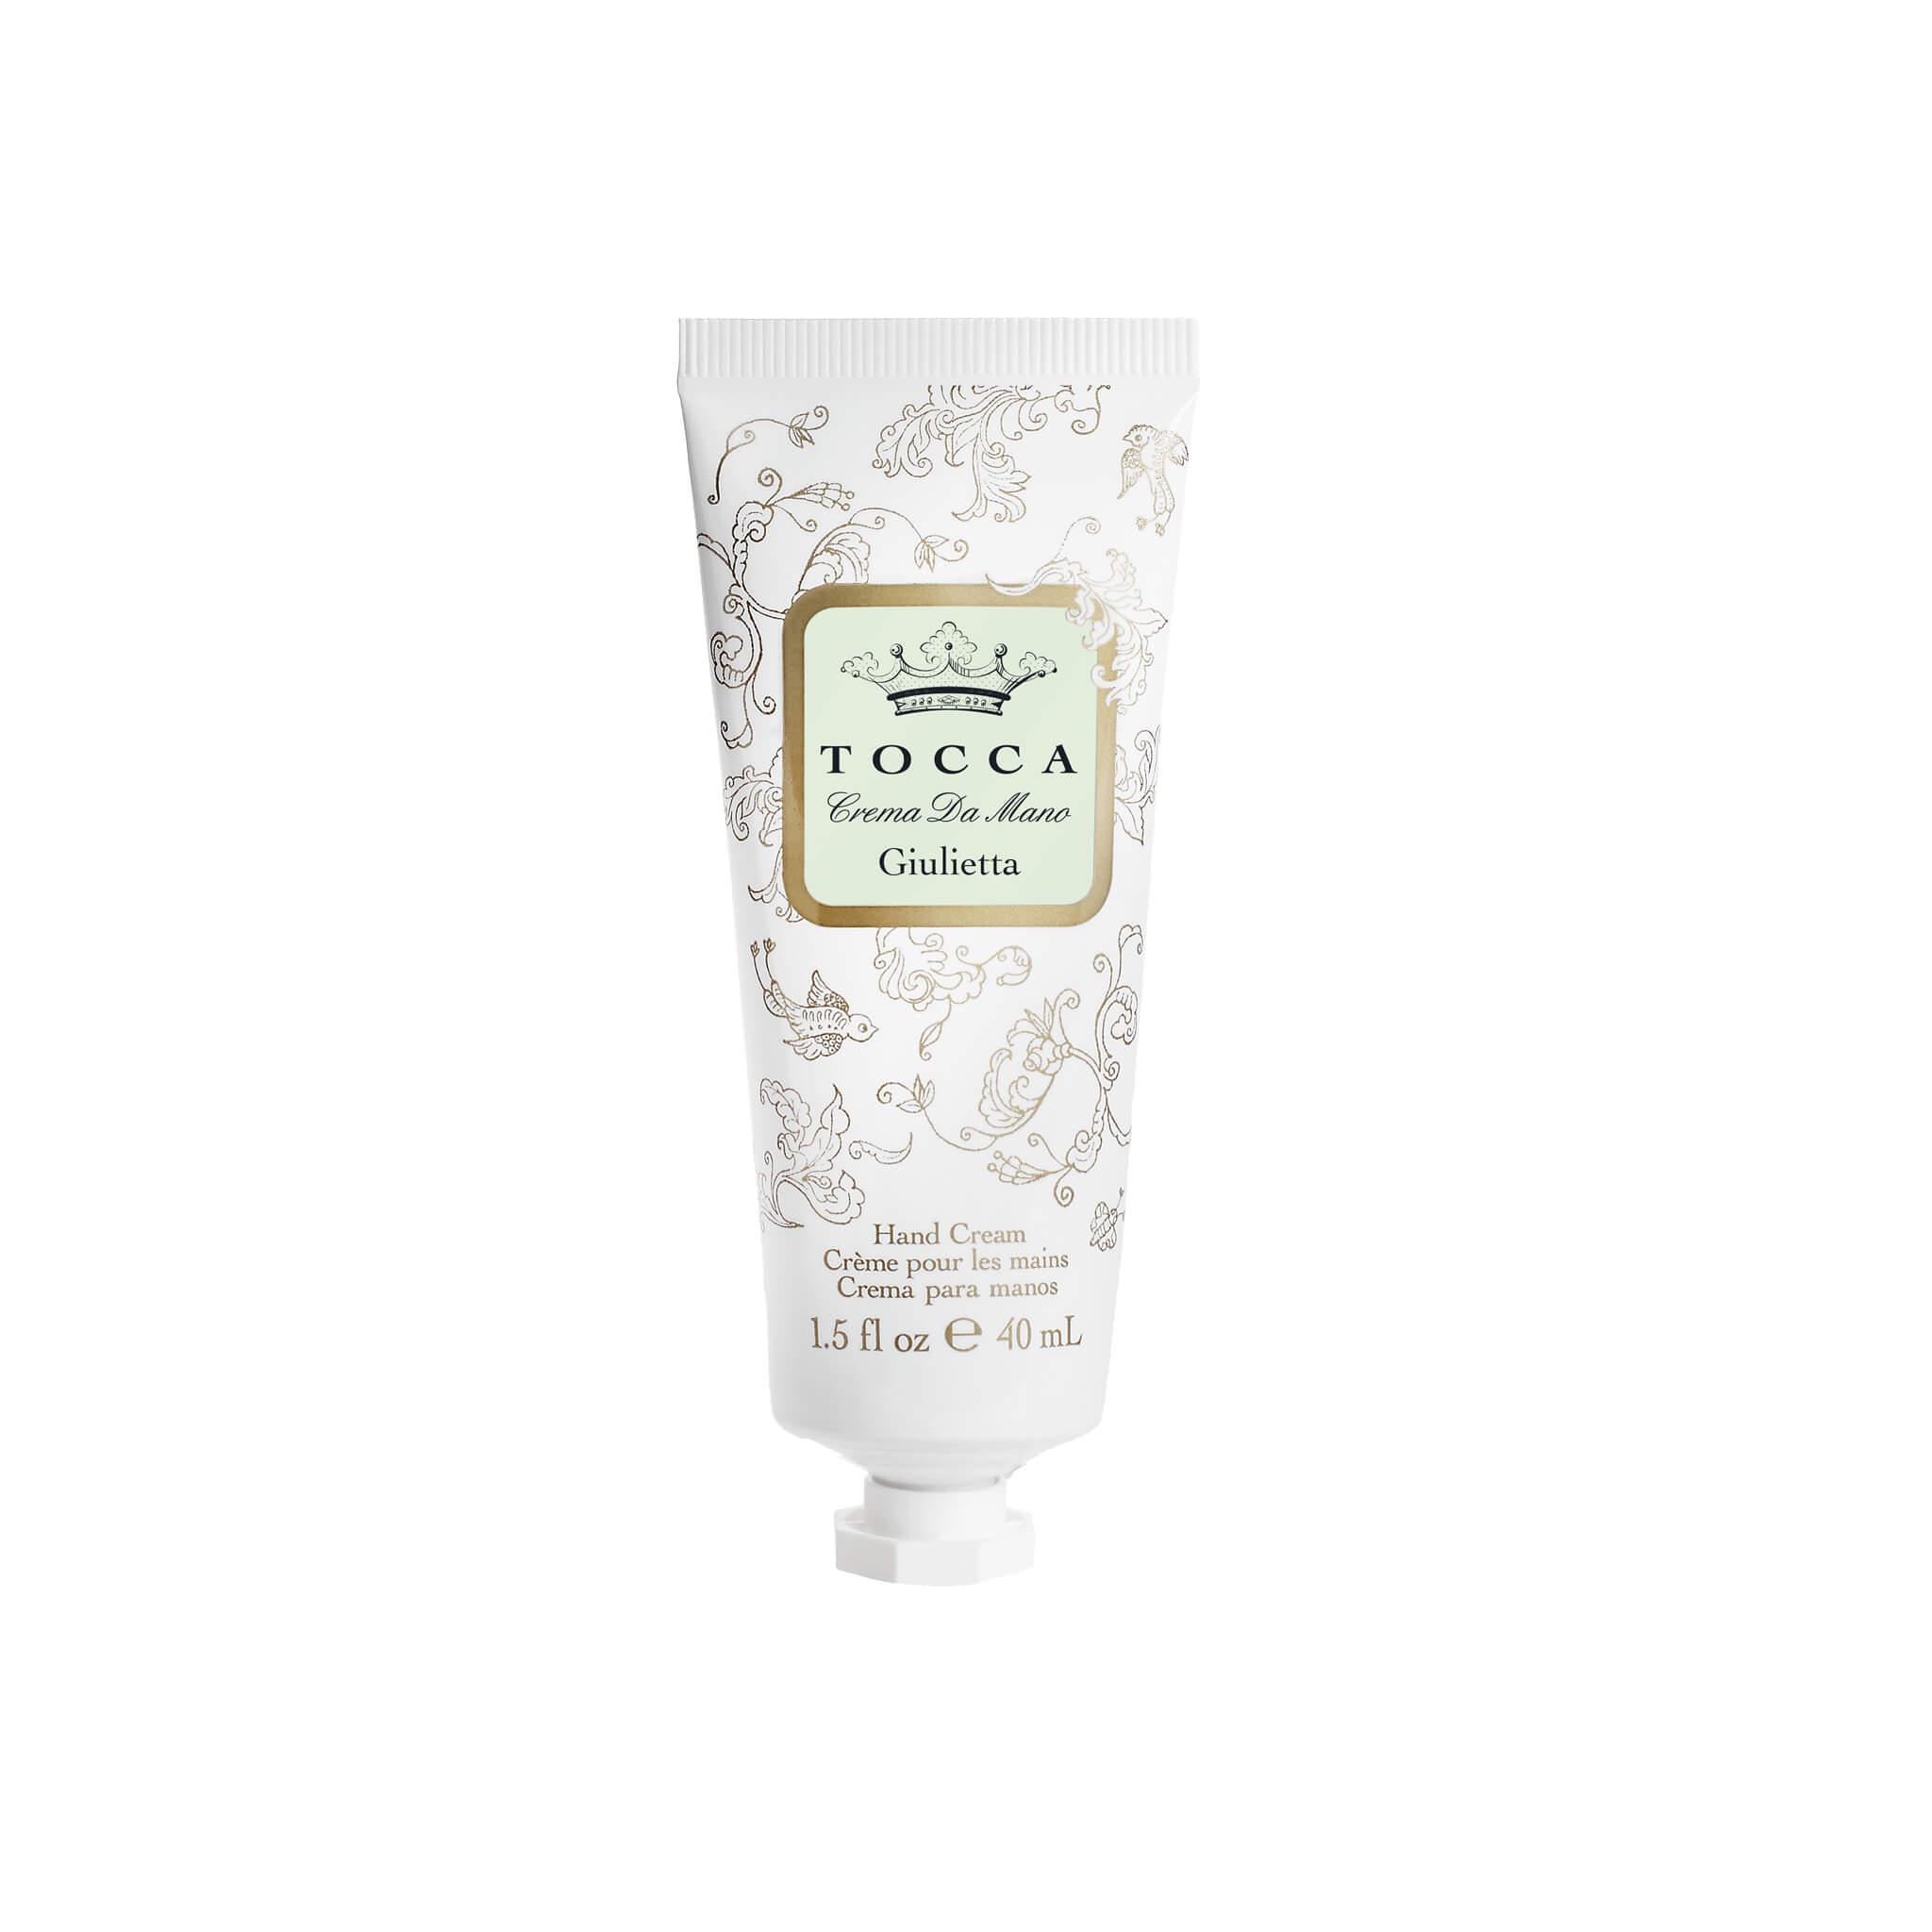 An image of Tocca Giulietta Crema da Mano Hand Cream 40ml